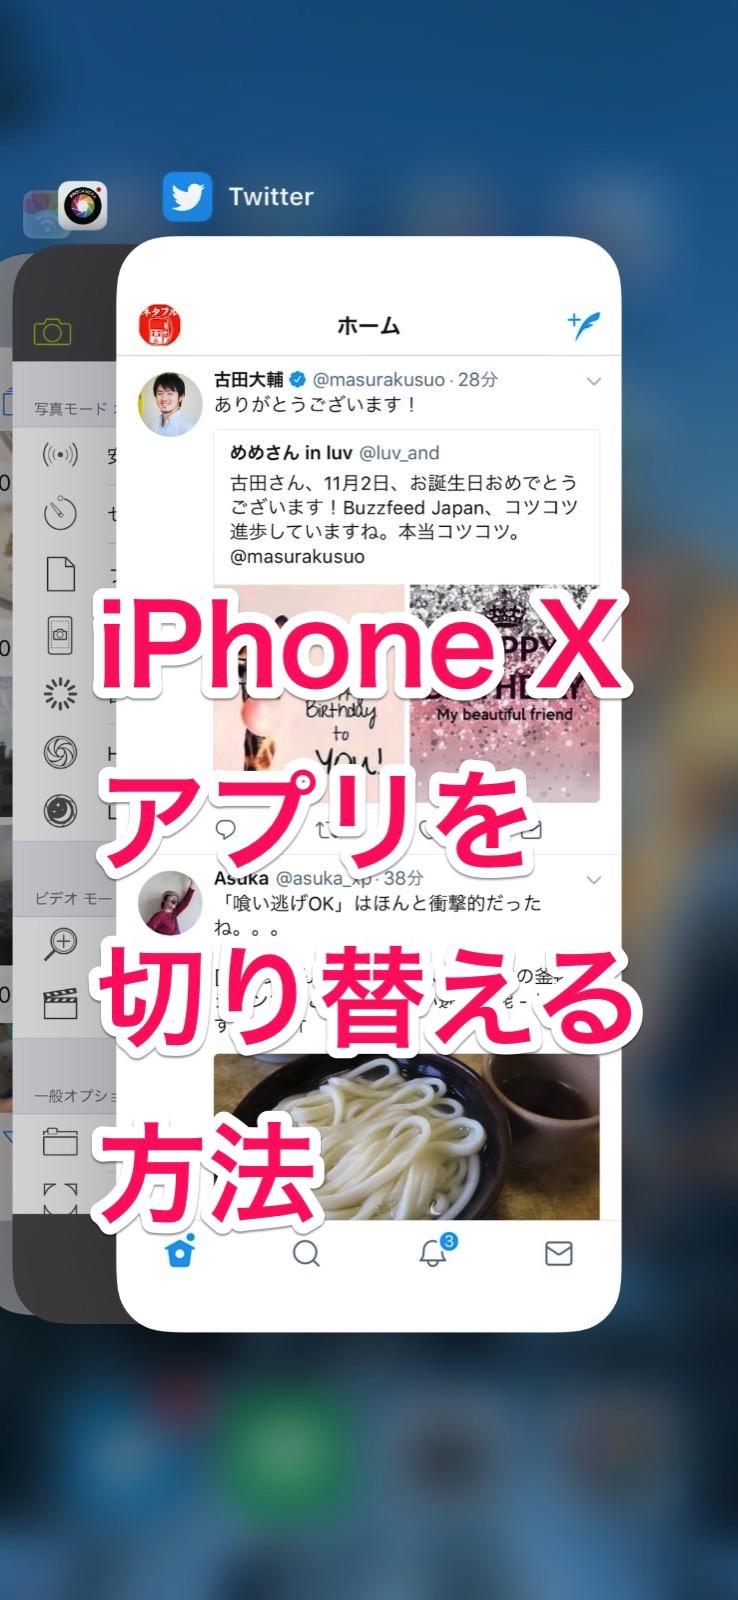 【iPhone X】アプリを切り替える方法(マルチタスキング)